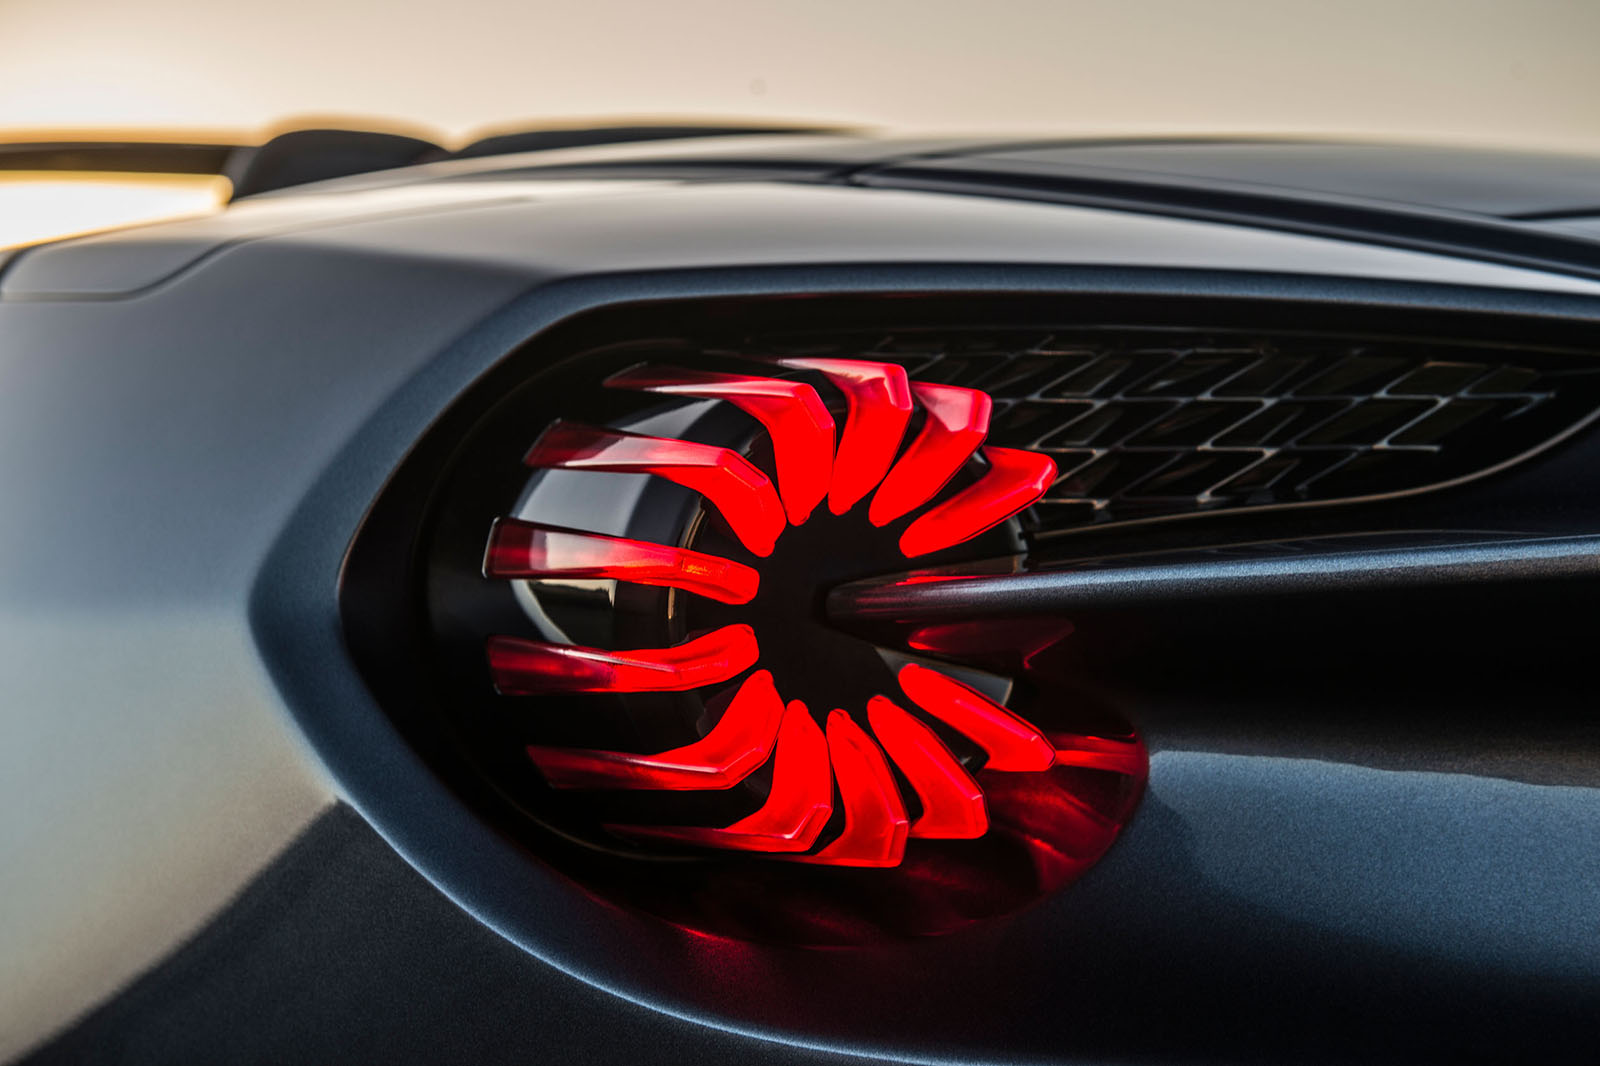 Aston Martin Vanquish Zagato Shooting Brake Styling Shown In Life Size Model Autocar